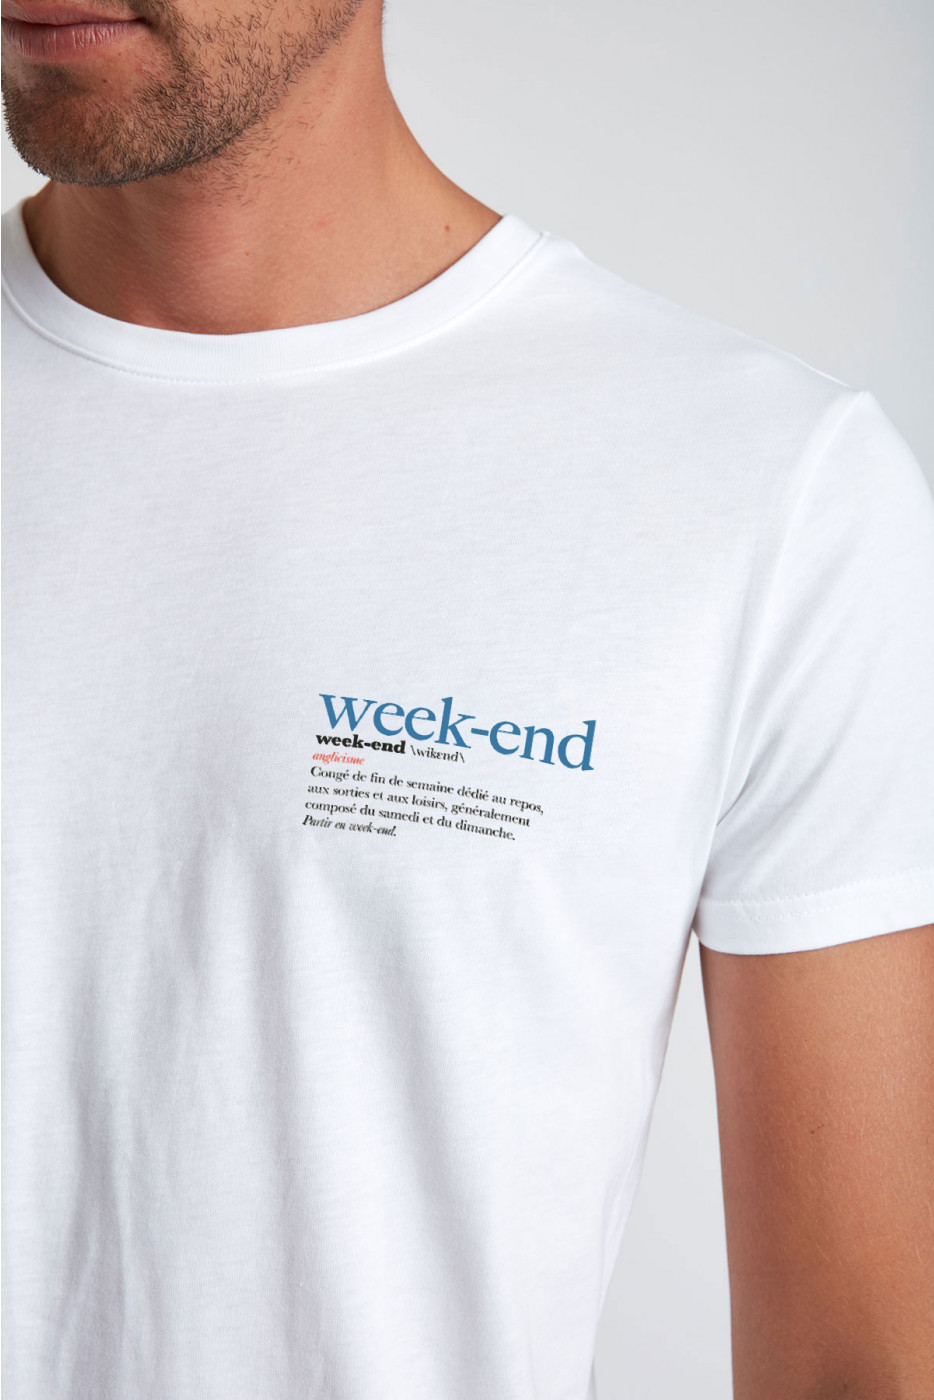 Tshirt Blanc YANNWEE DICTIO